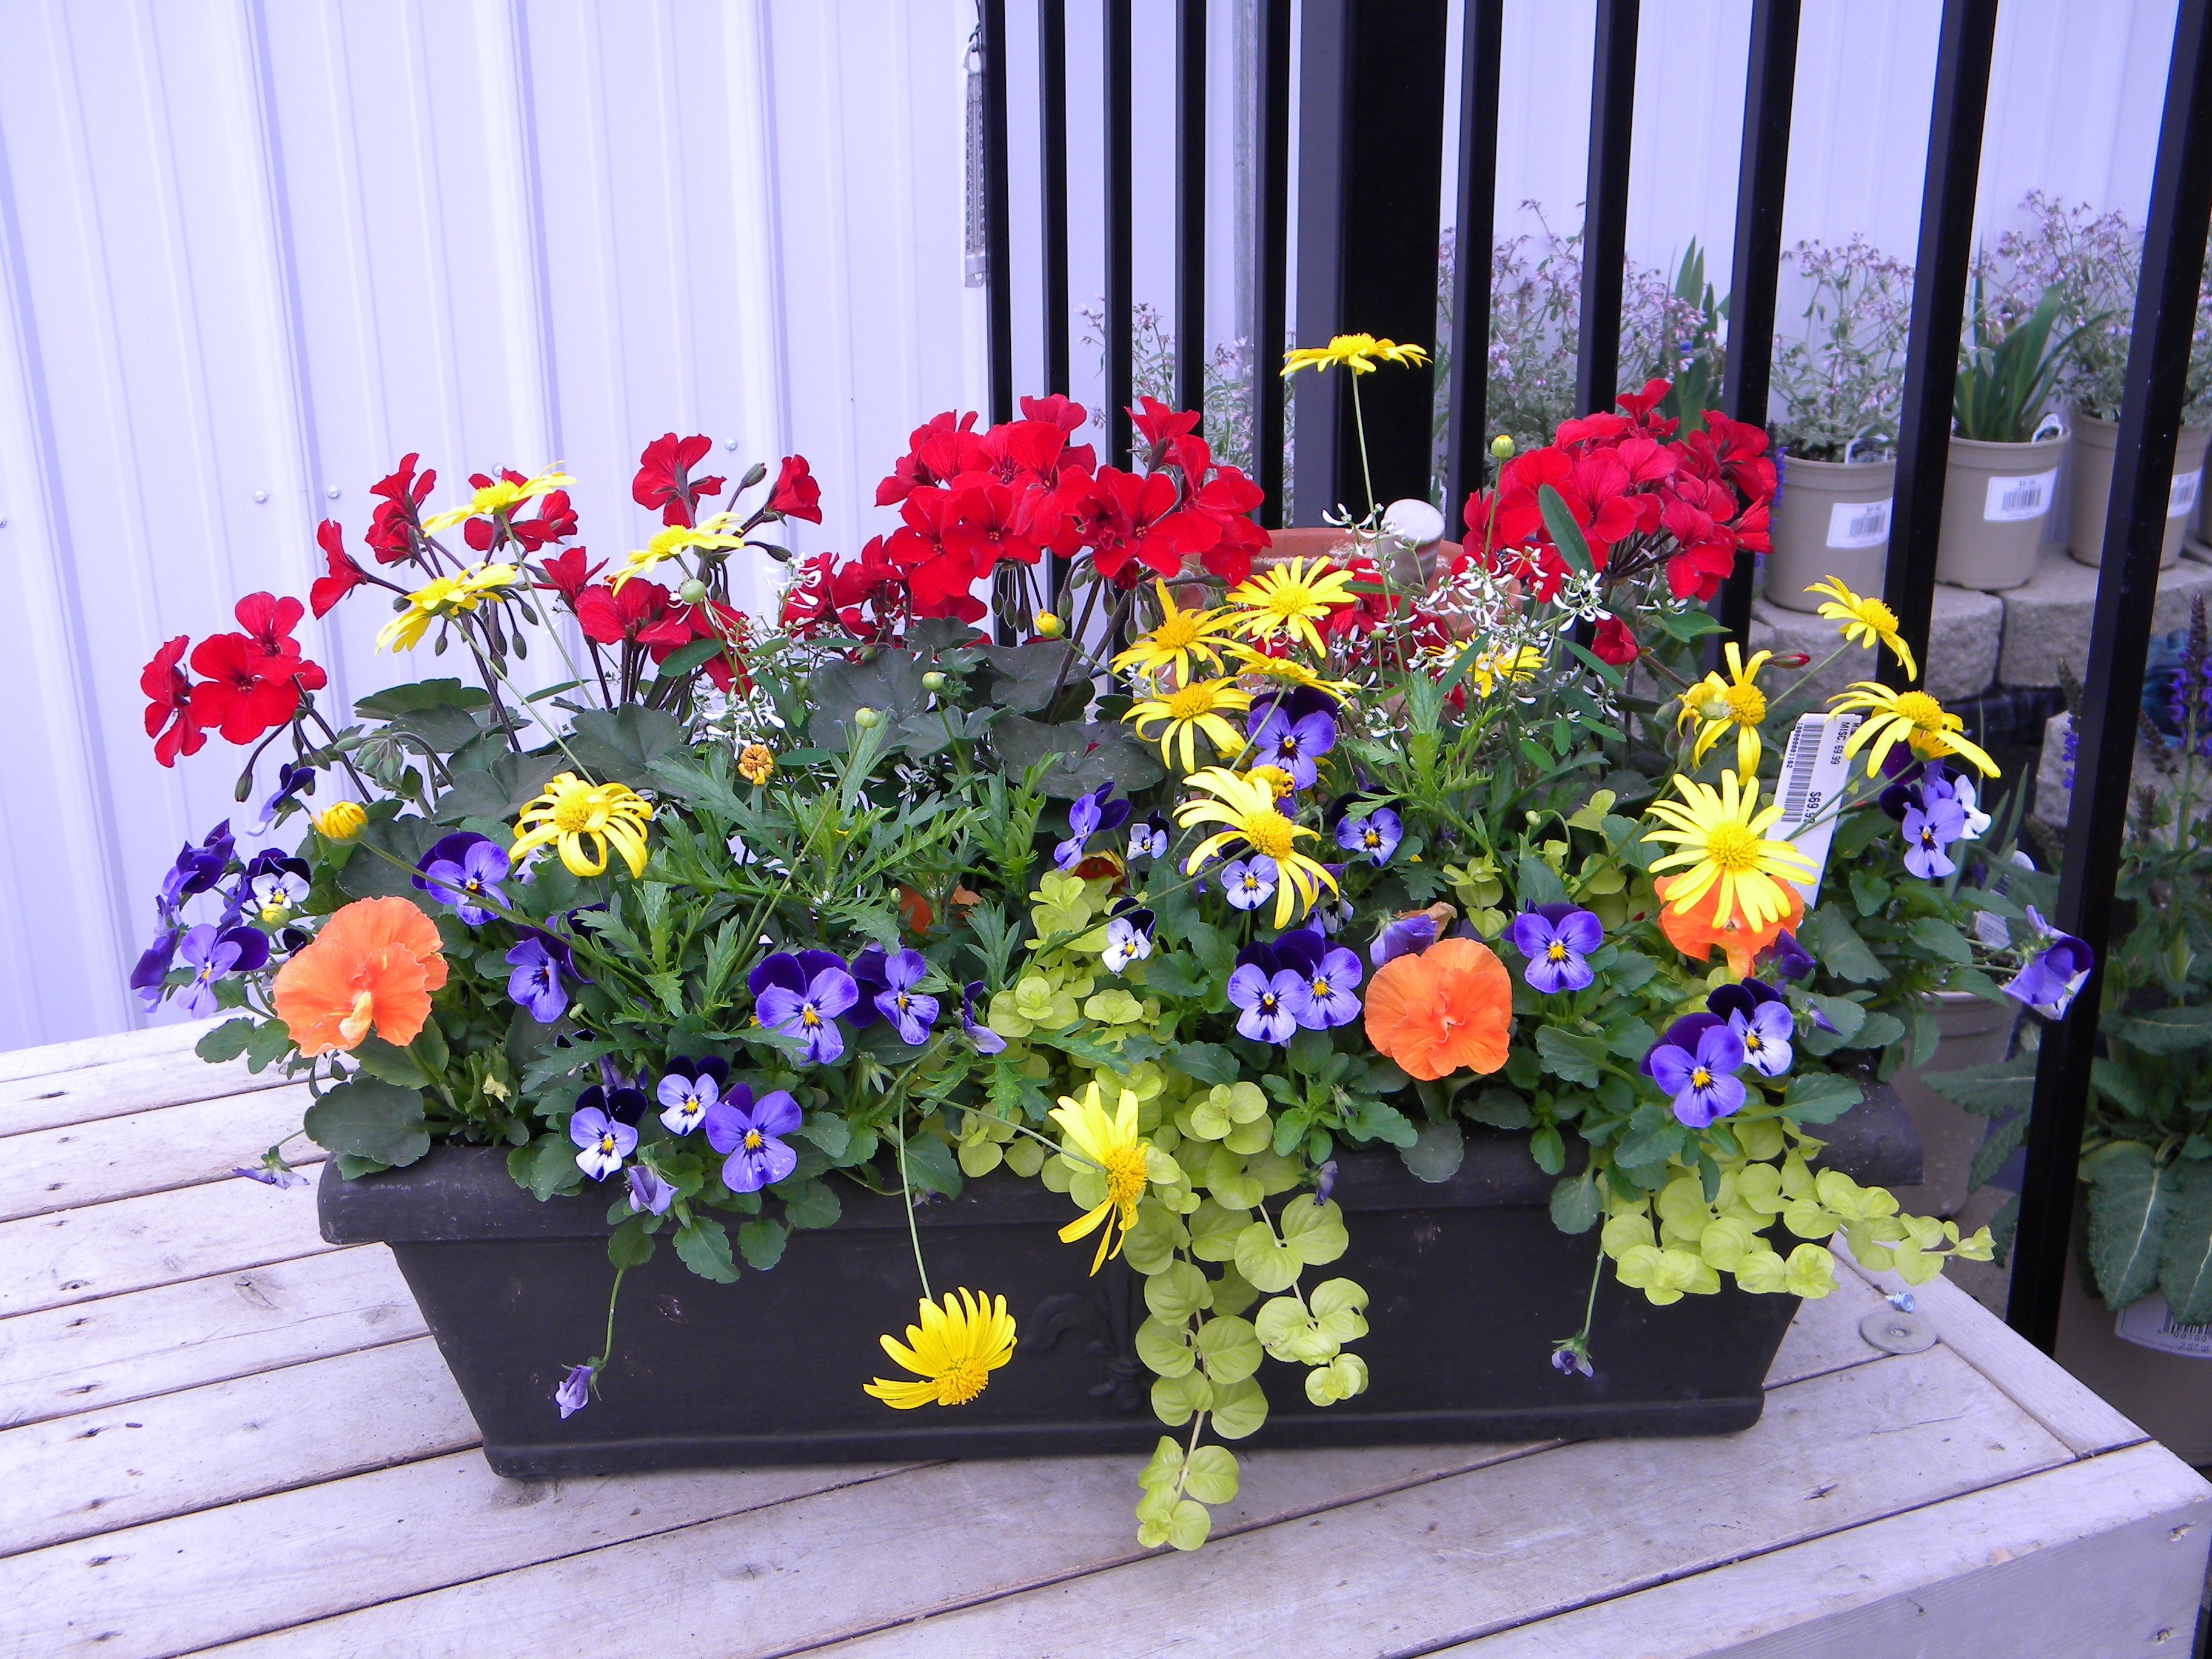 Window Box Idea Red Caliente Geraniums Yellow Euryops